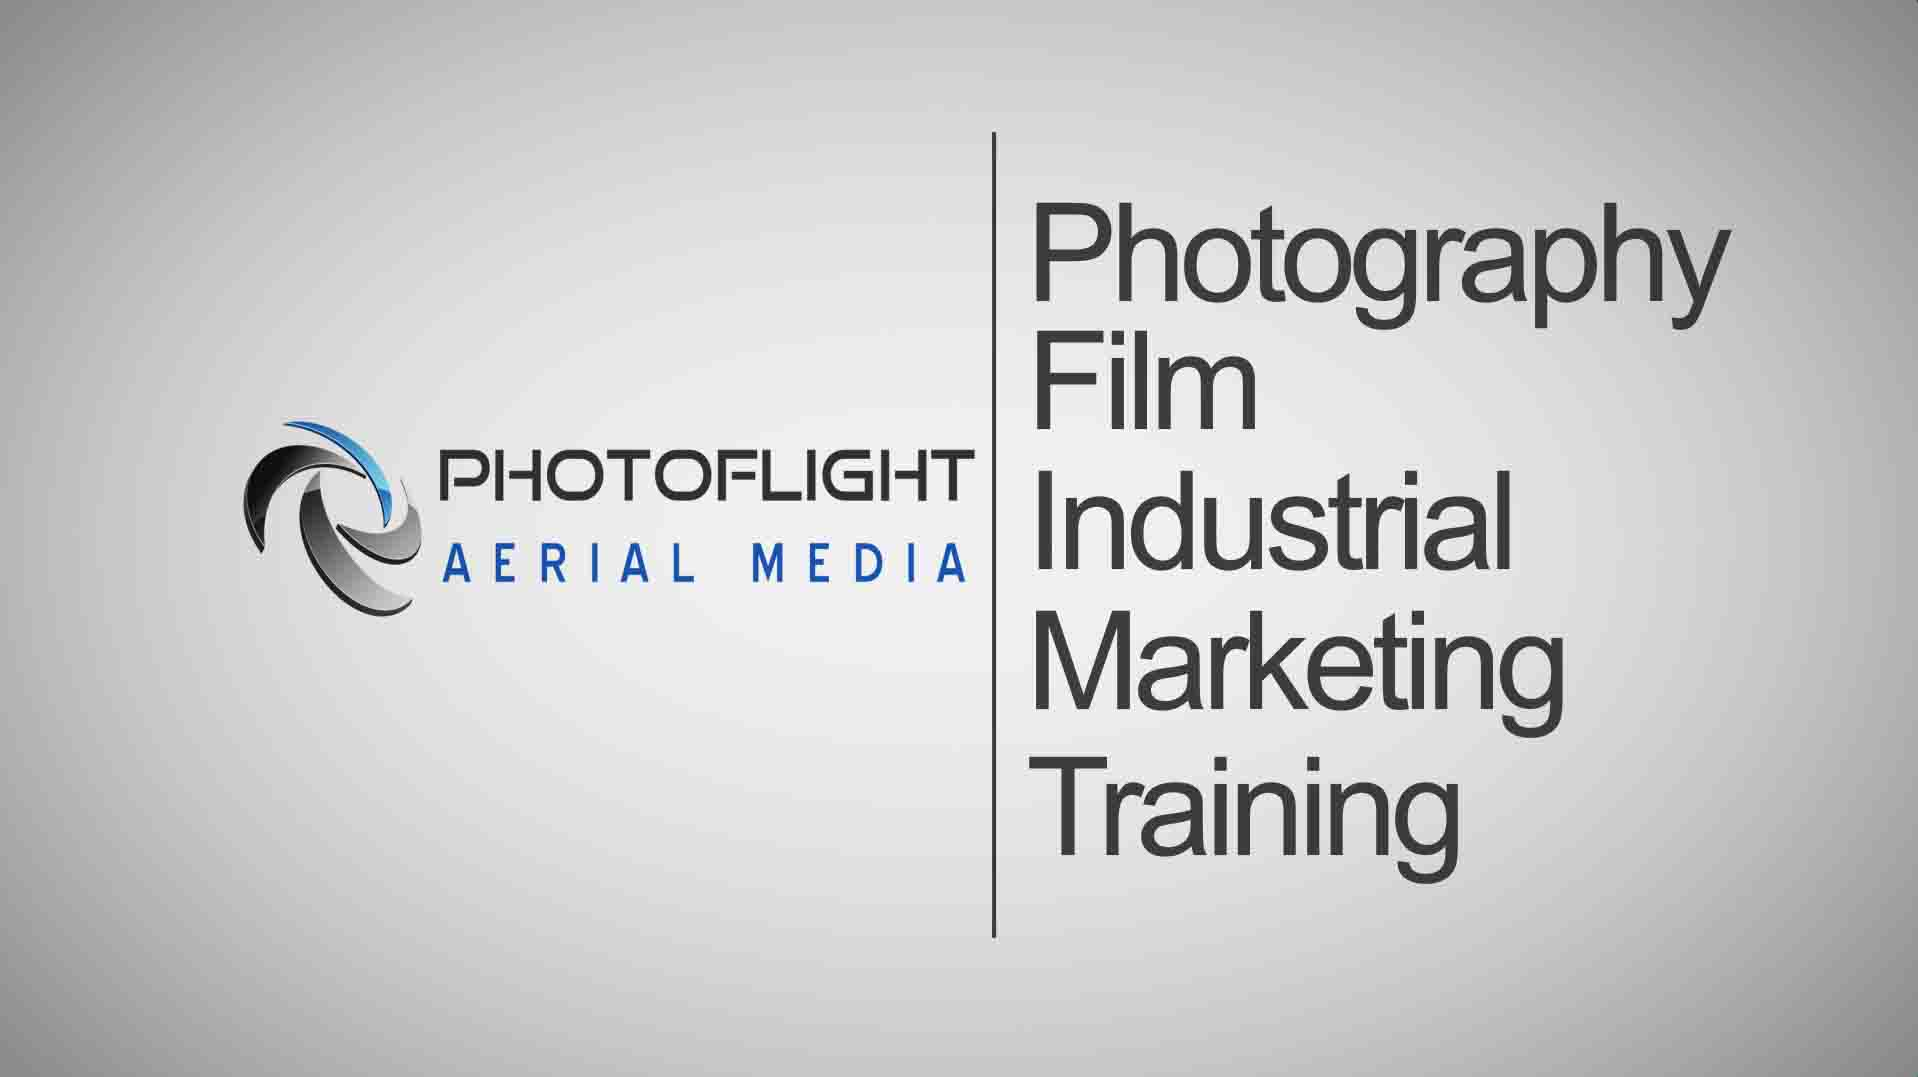 PhotoFlight Aerial Media announces acquisition of Notadrone.com & 500 Feet Drones